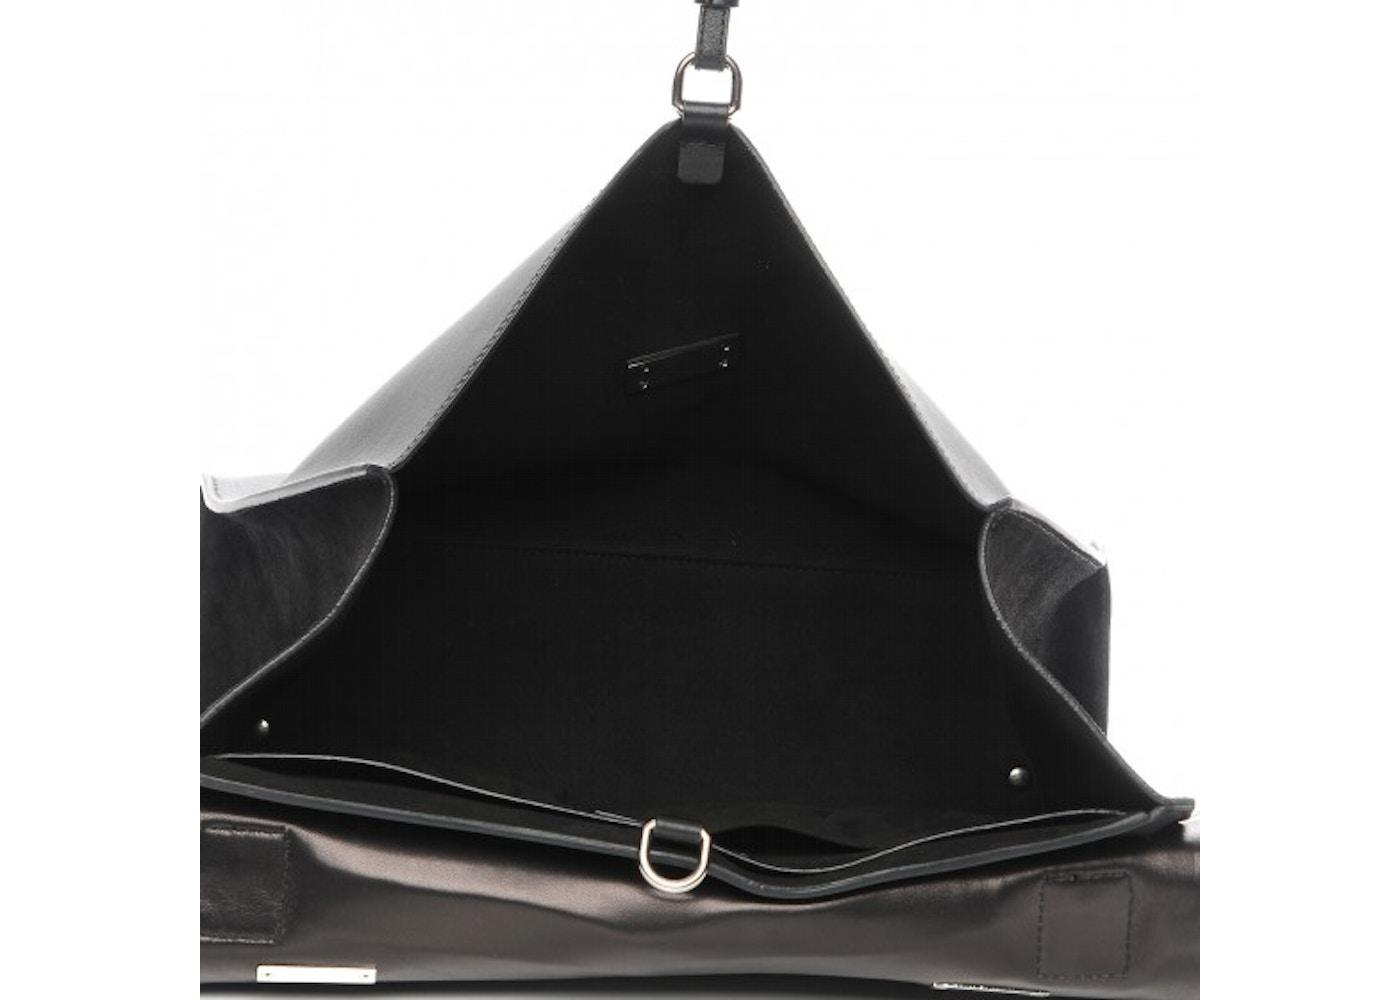 60a2bed72cc Givenchy Shark Lock Satchel Croc Stamped Calfskin Large Black